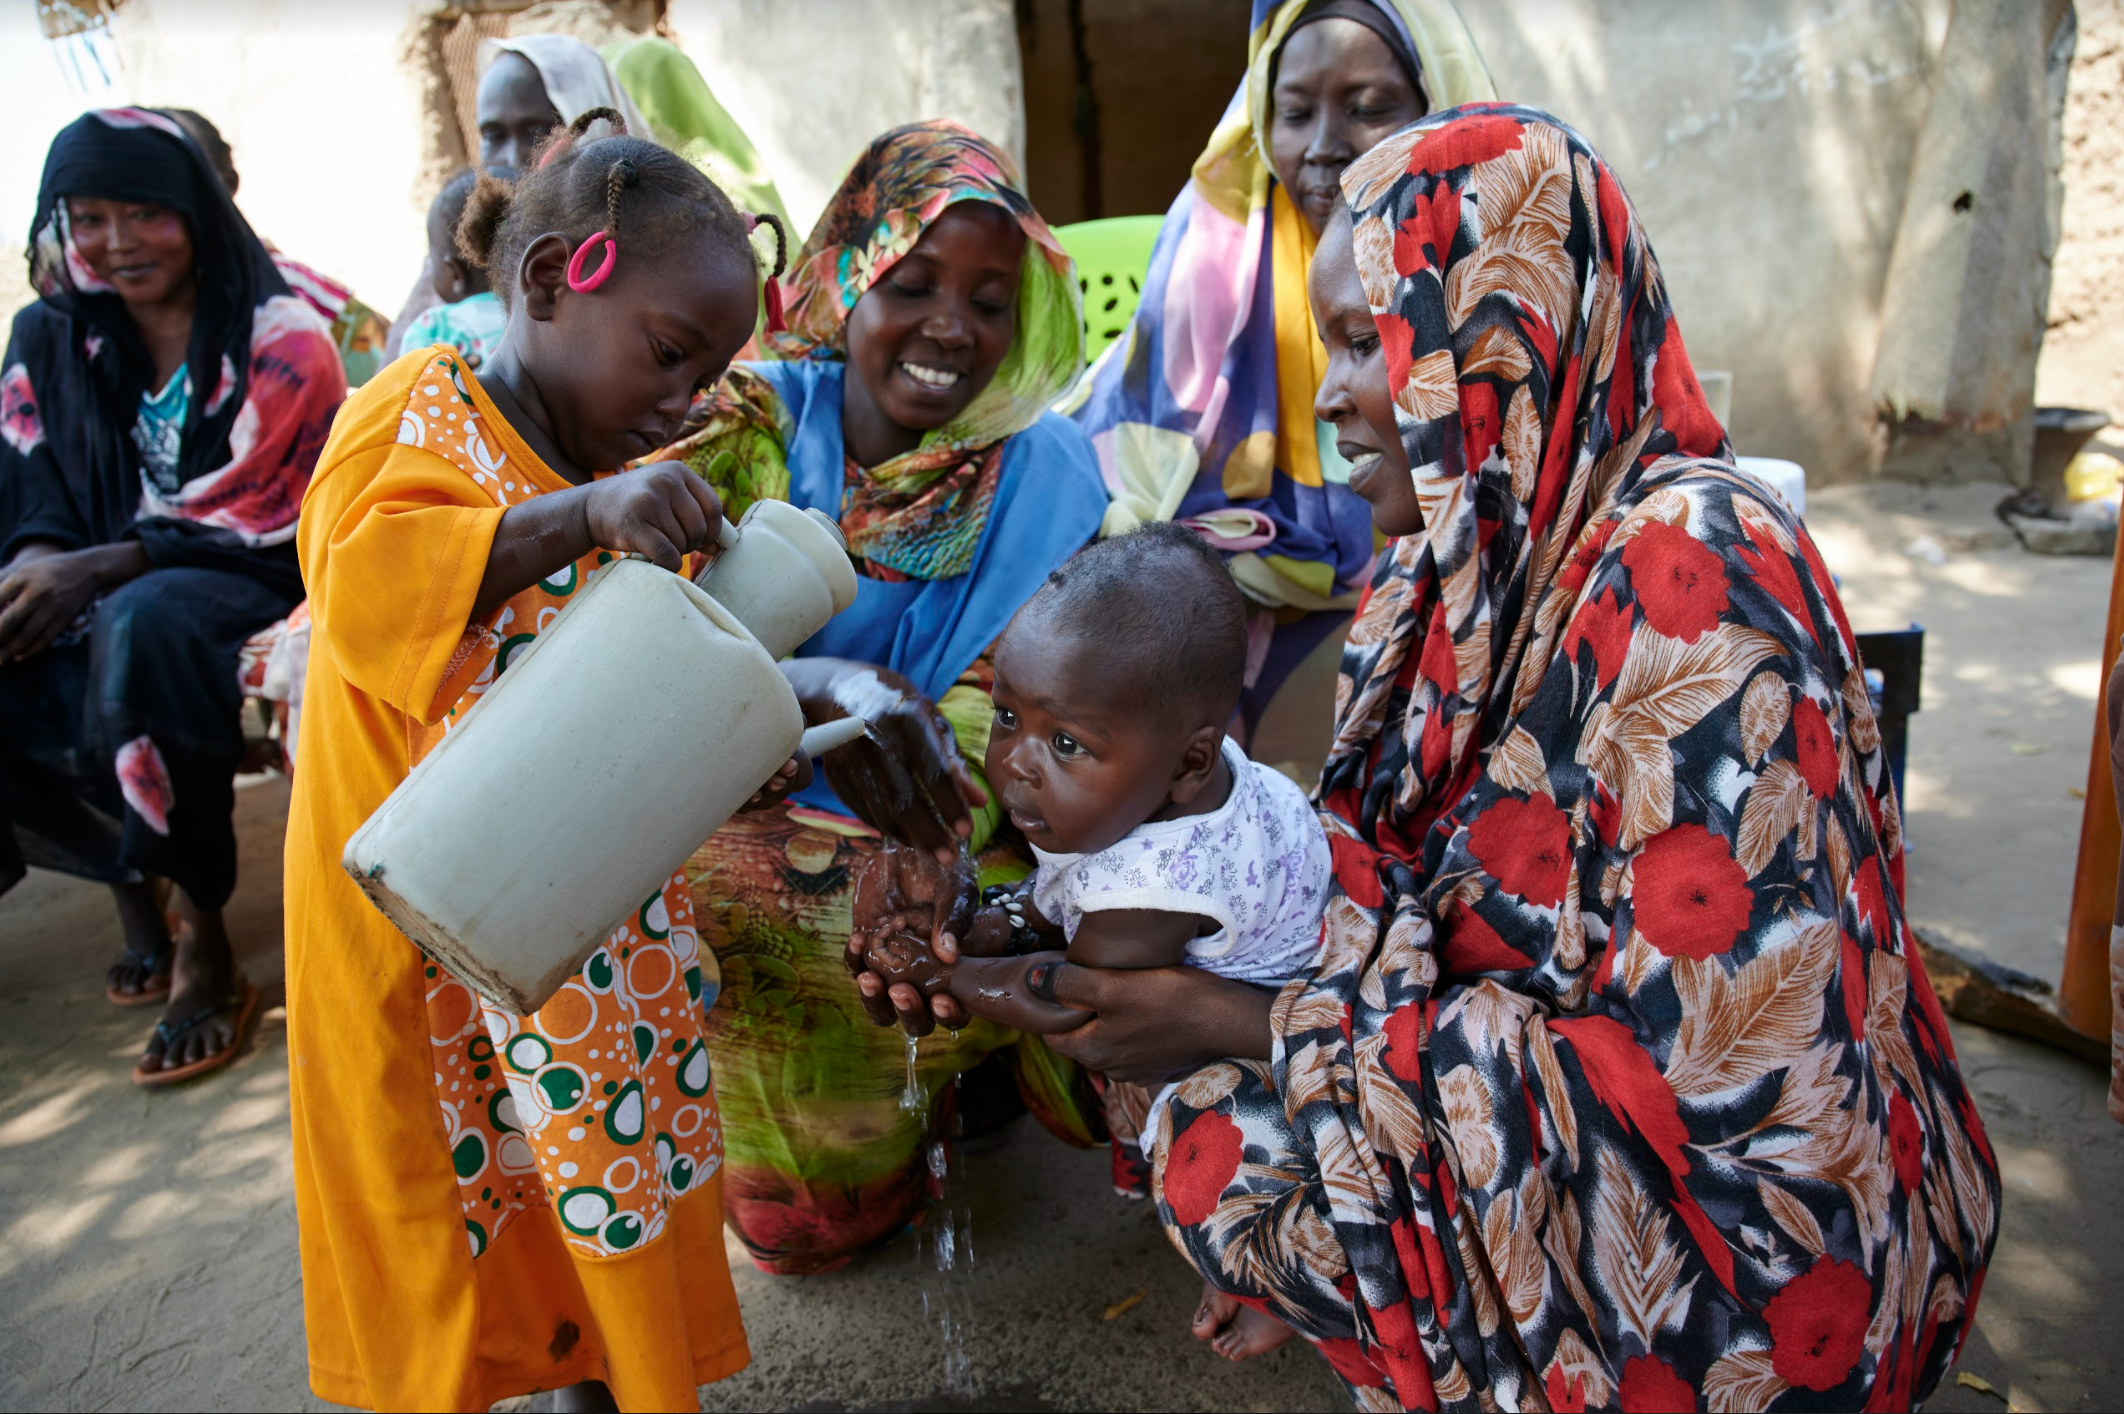 SAMA-UNICEF USA Partnership